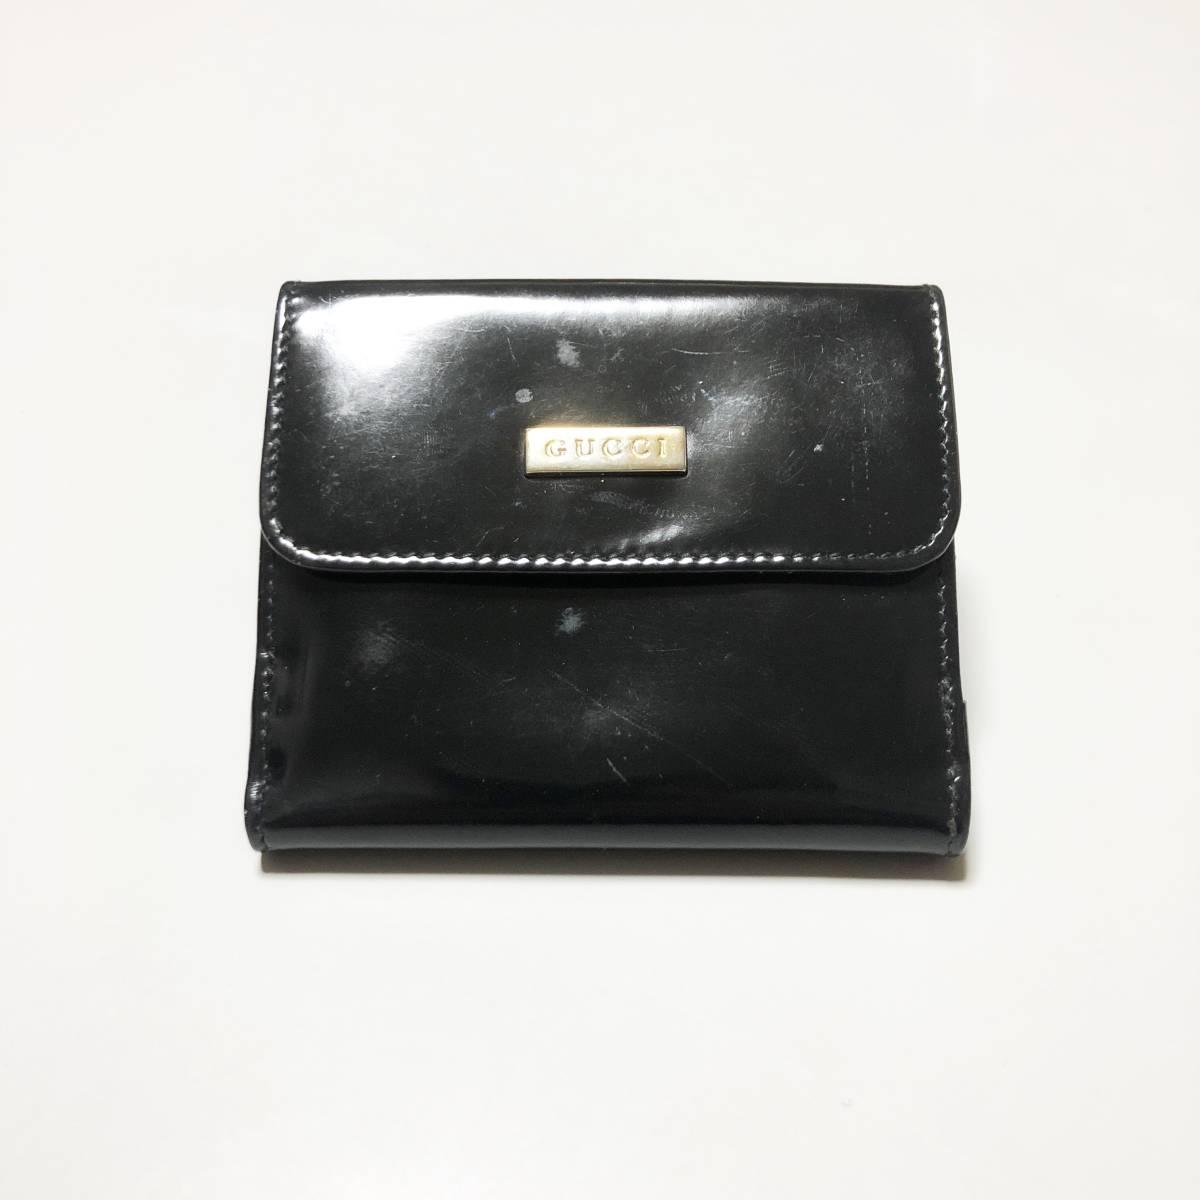 01248602e33f 代購代標第一品牌- 樂淘letao - GUCCI グッチ折りたたみ財布エナメル黒